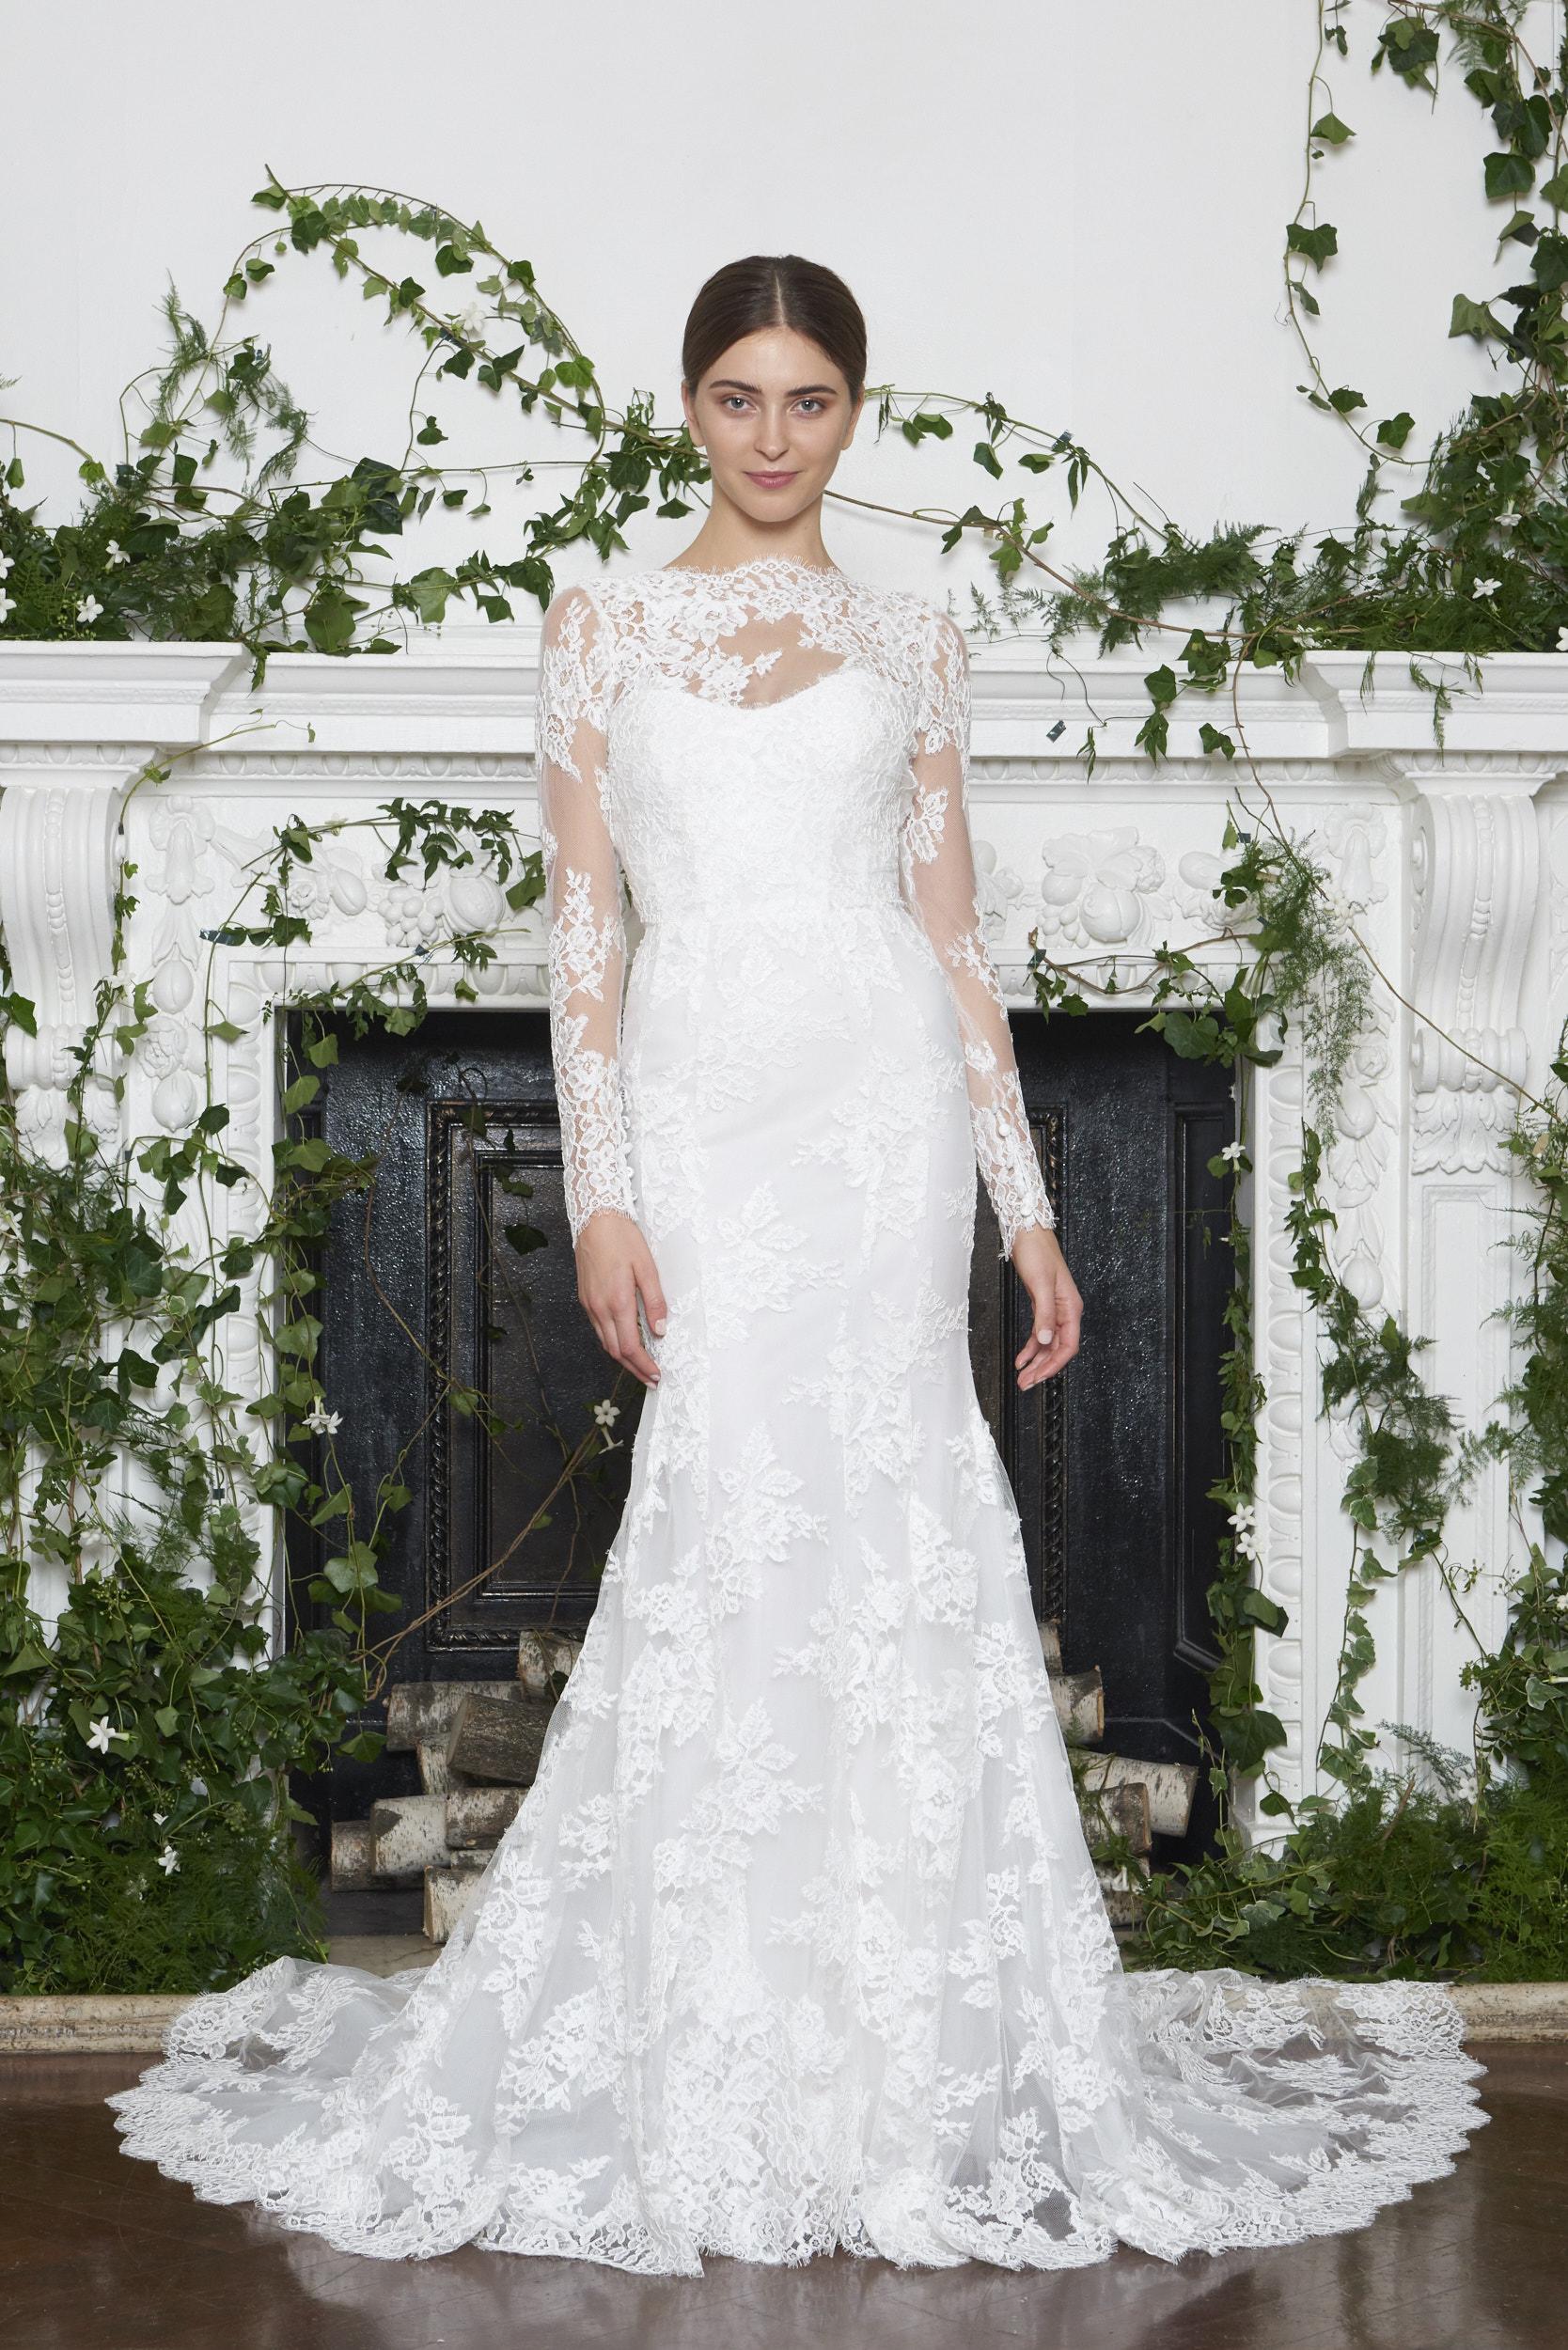 Monique Lhuillier Fall 2018 Long Sleeved Slim Lace Trumpet Wedding Dress